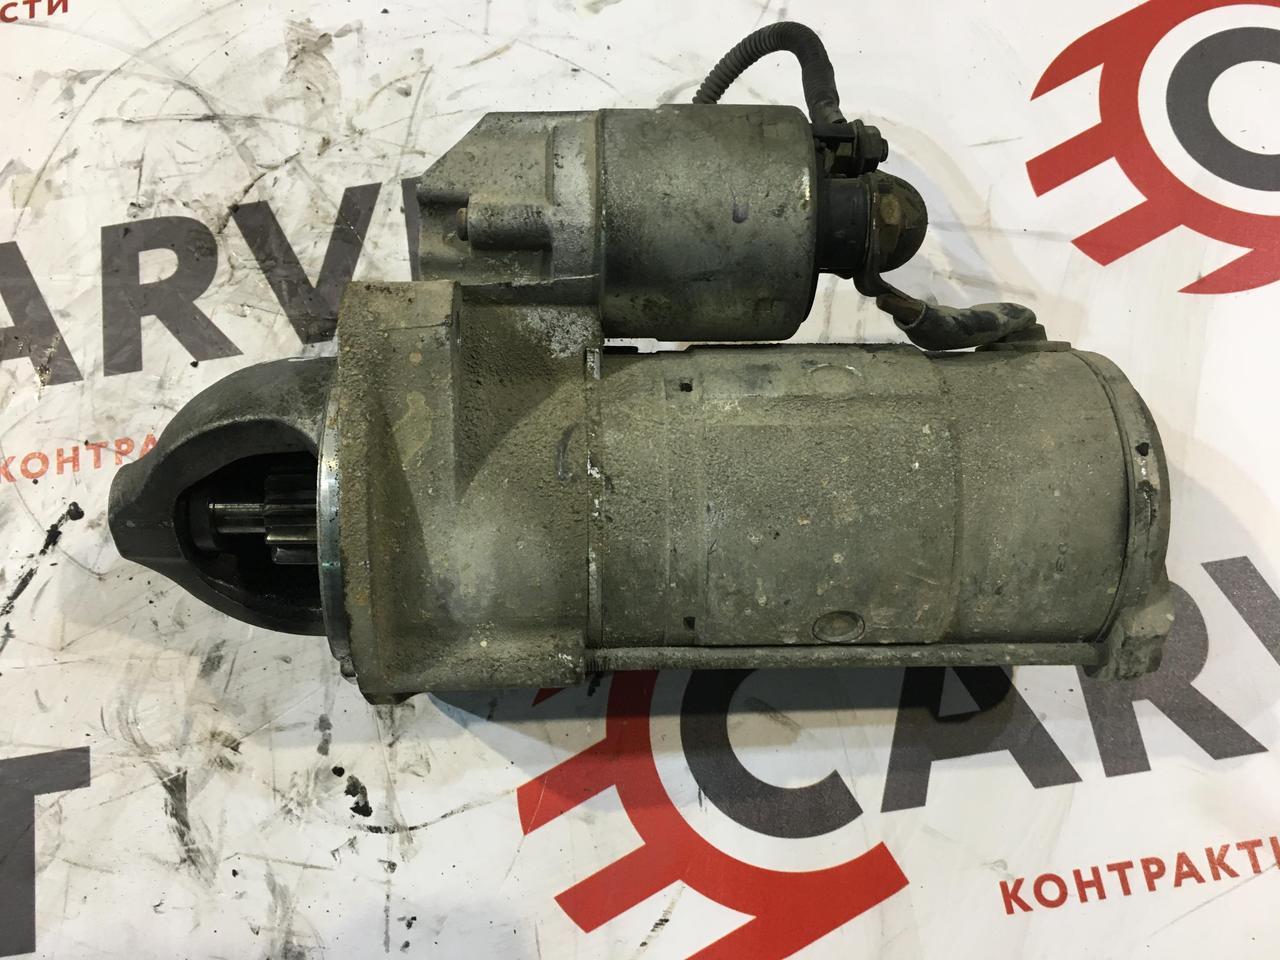 Стартер двигателя Ssangyong Actyon. D20DT (664.951). , 2.0л., 141л.с.